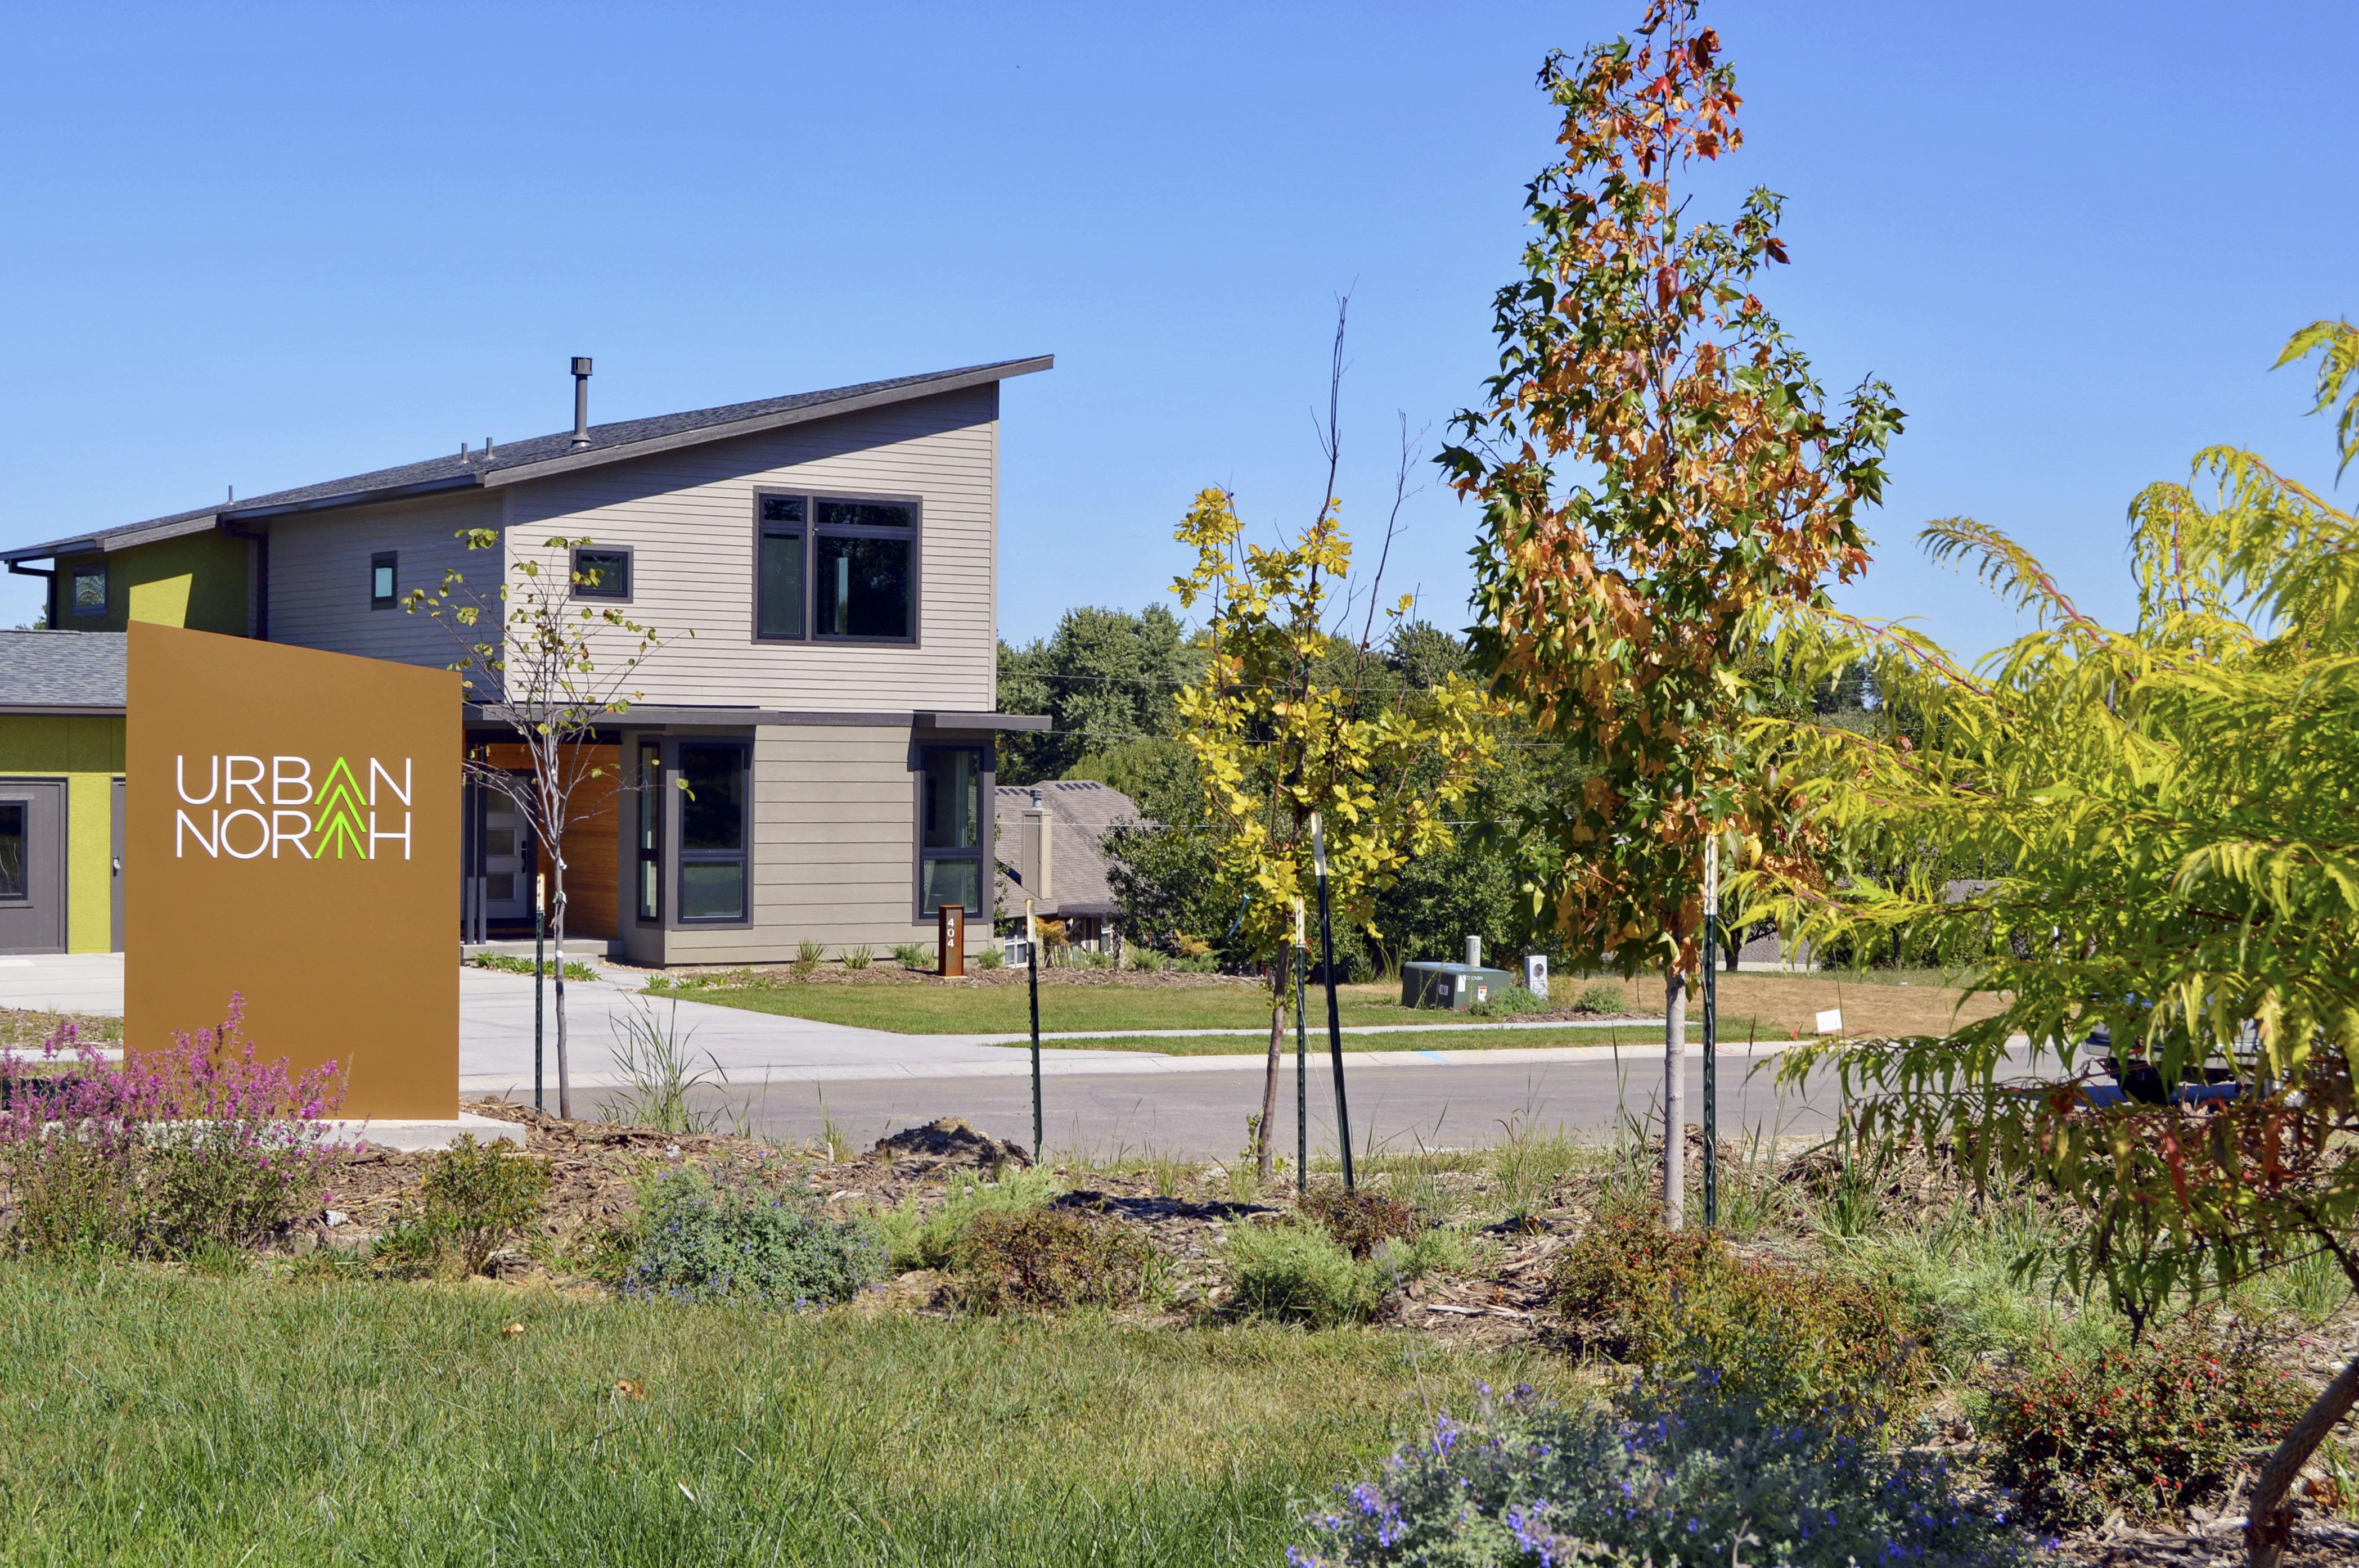 Home urban north kansas citys new modern subdivision